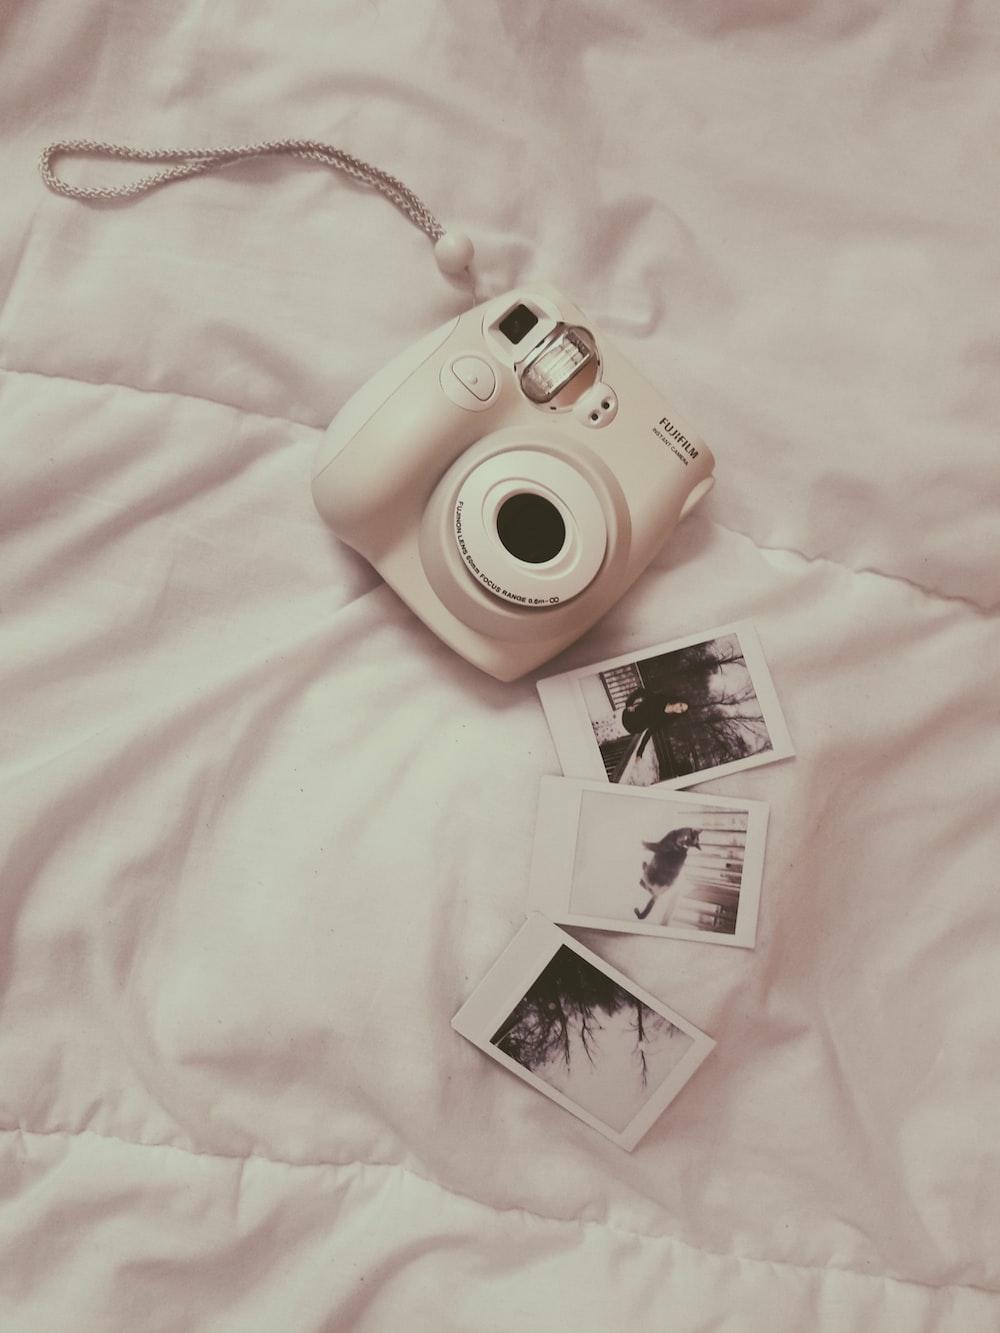 white Fujifilm instant camera on white comforter